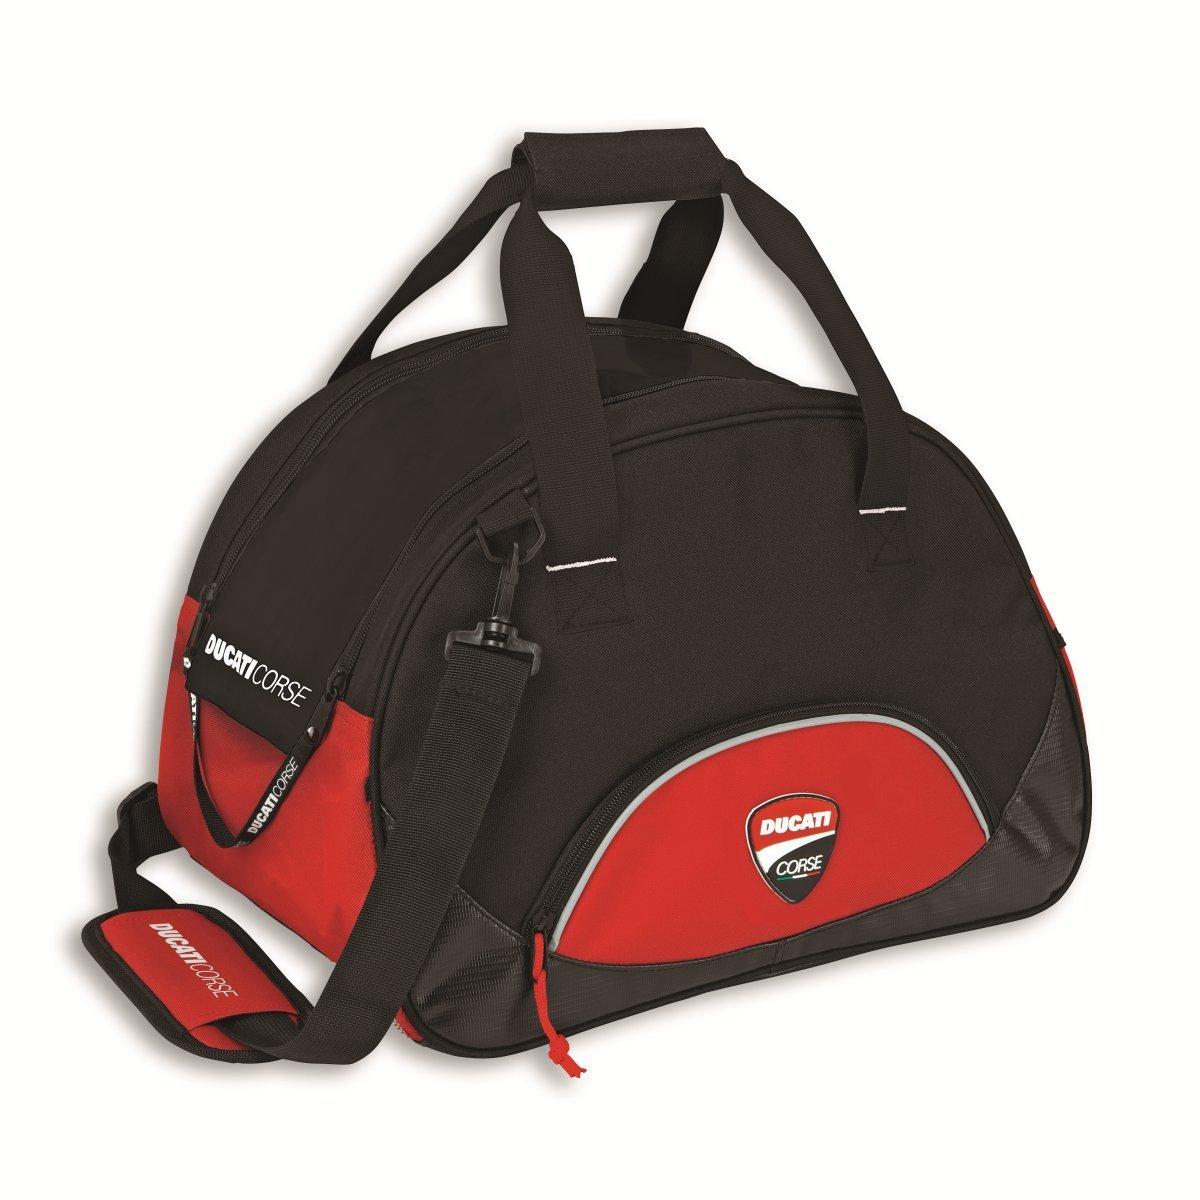 Ducati 987689732 Corse Helmet Bag